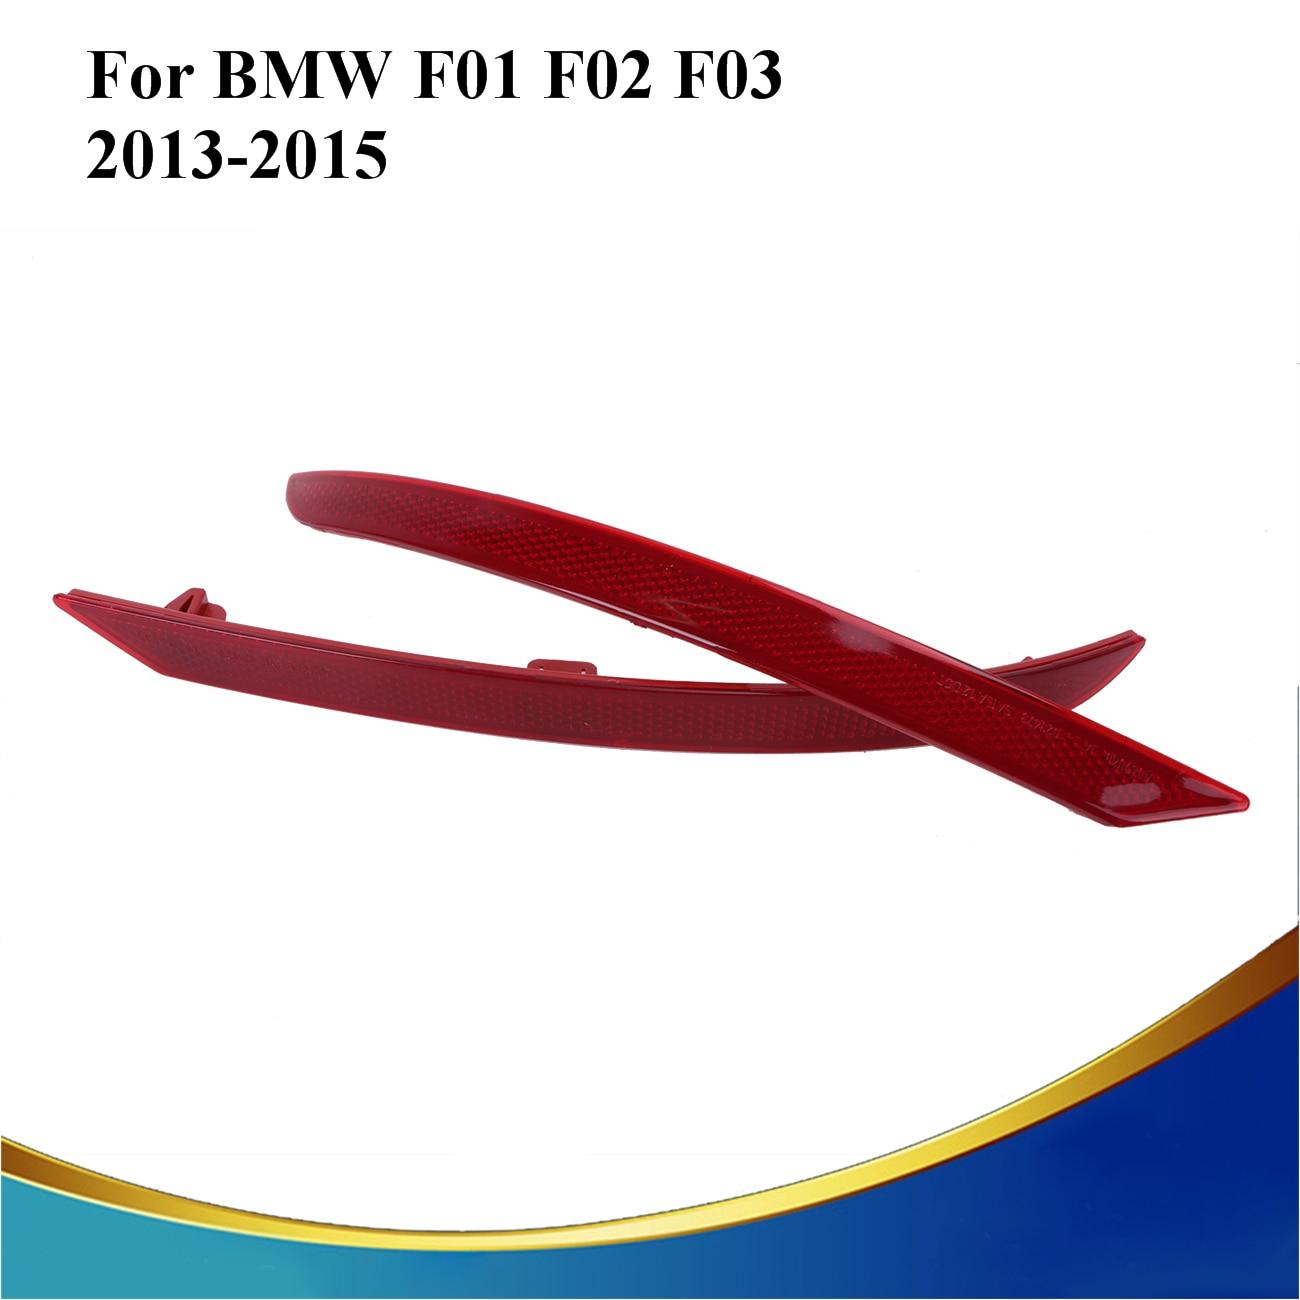 2PCS Red Lens Rear Bumper Reflector Fog Warn Light  For BMW F01 F02 F03 740i 750i 760Li 2013 2014 2015 Replacement #3098